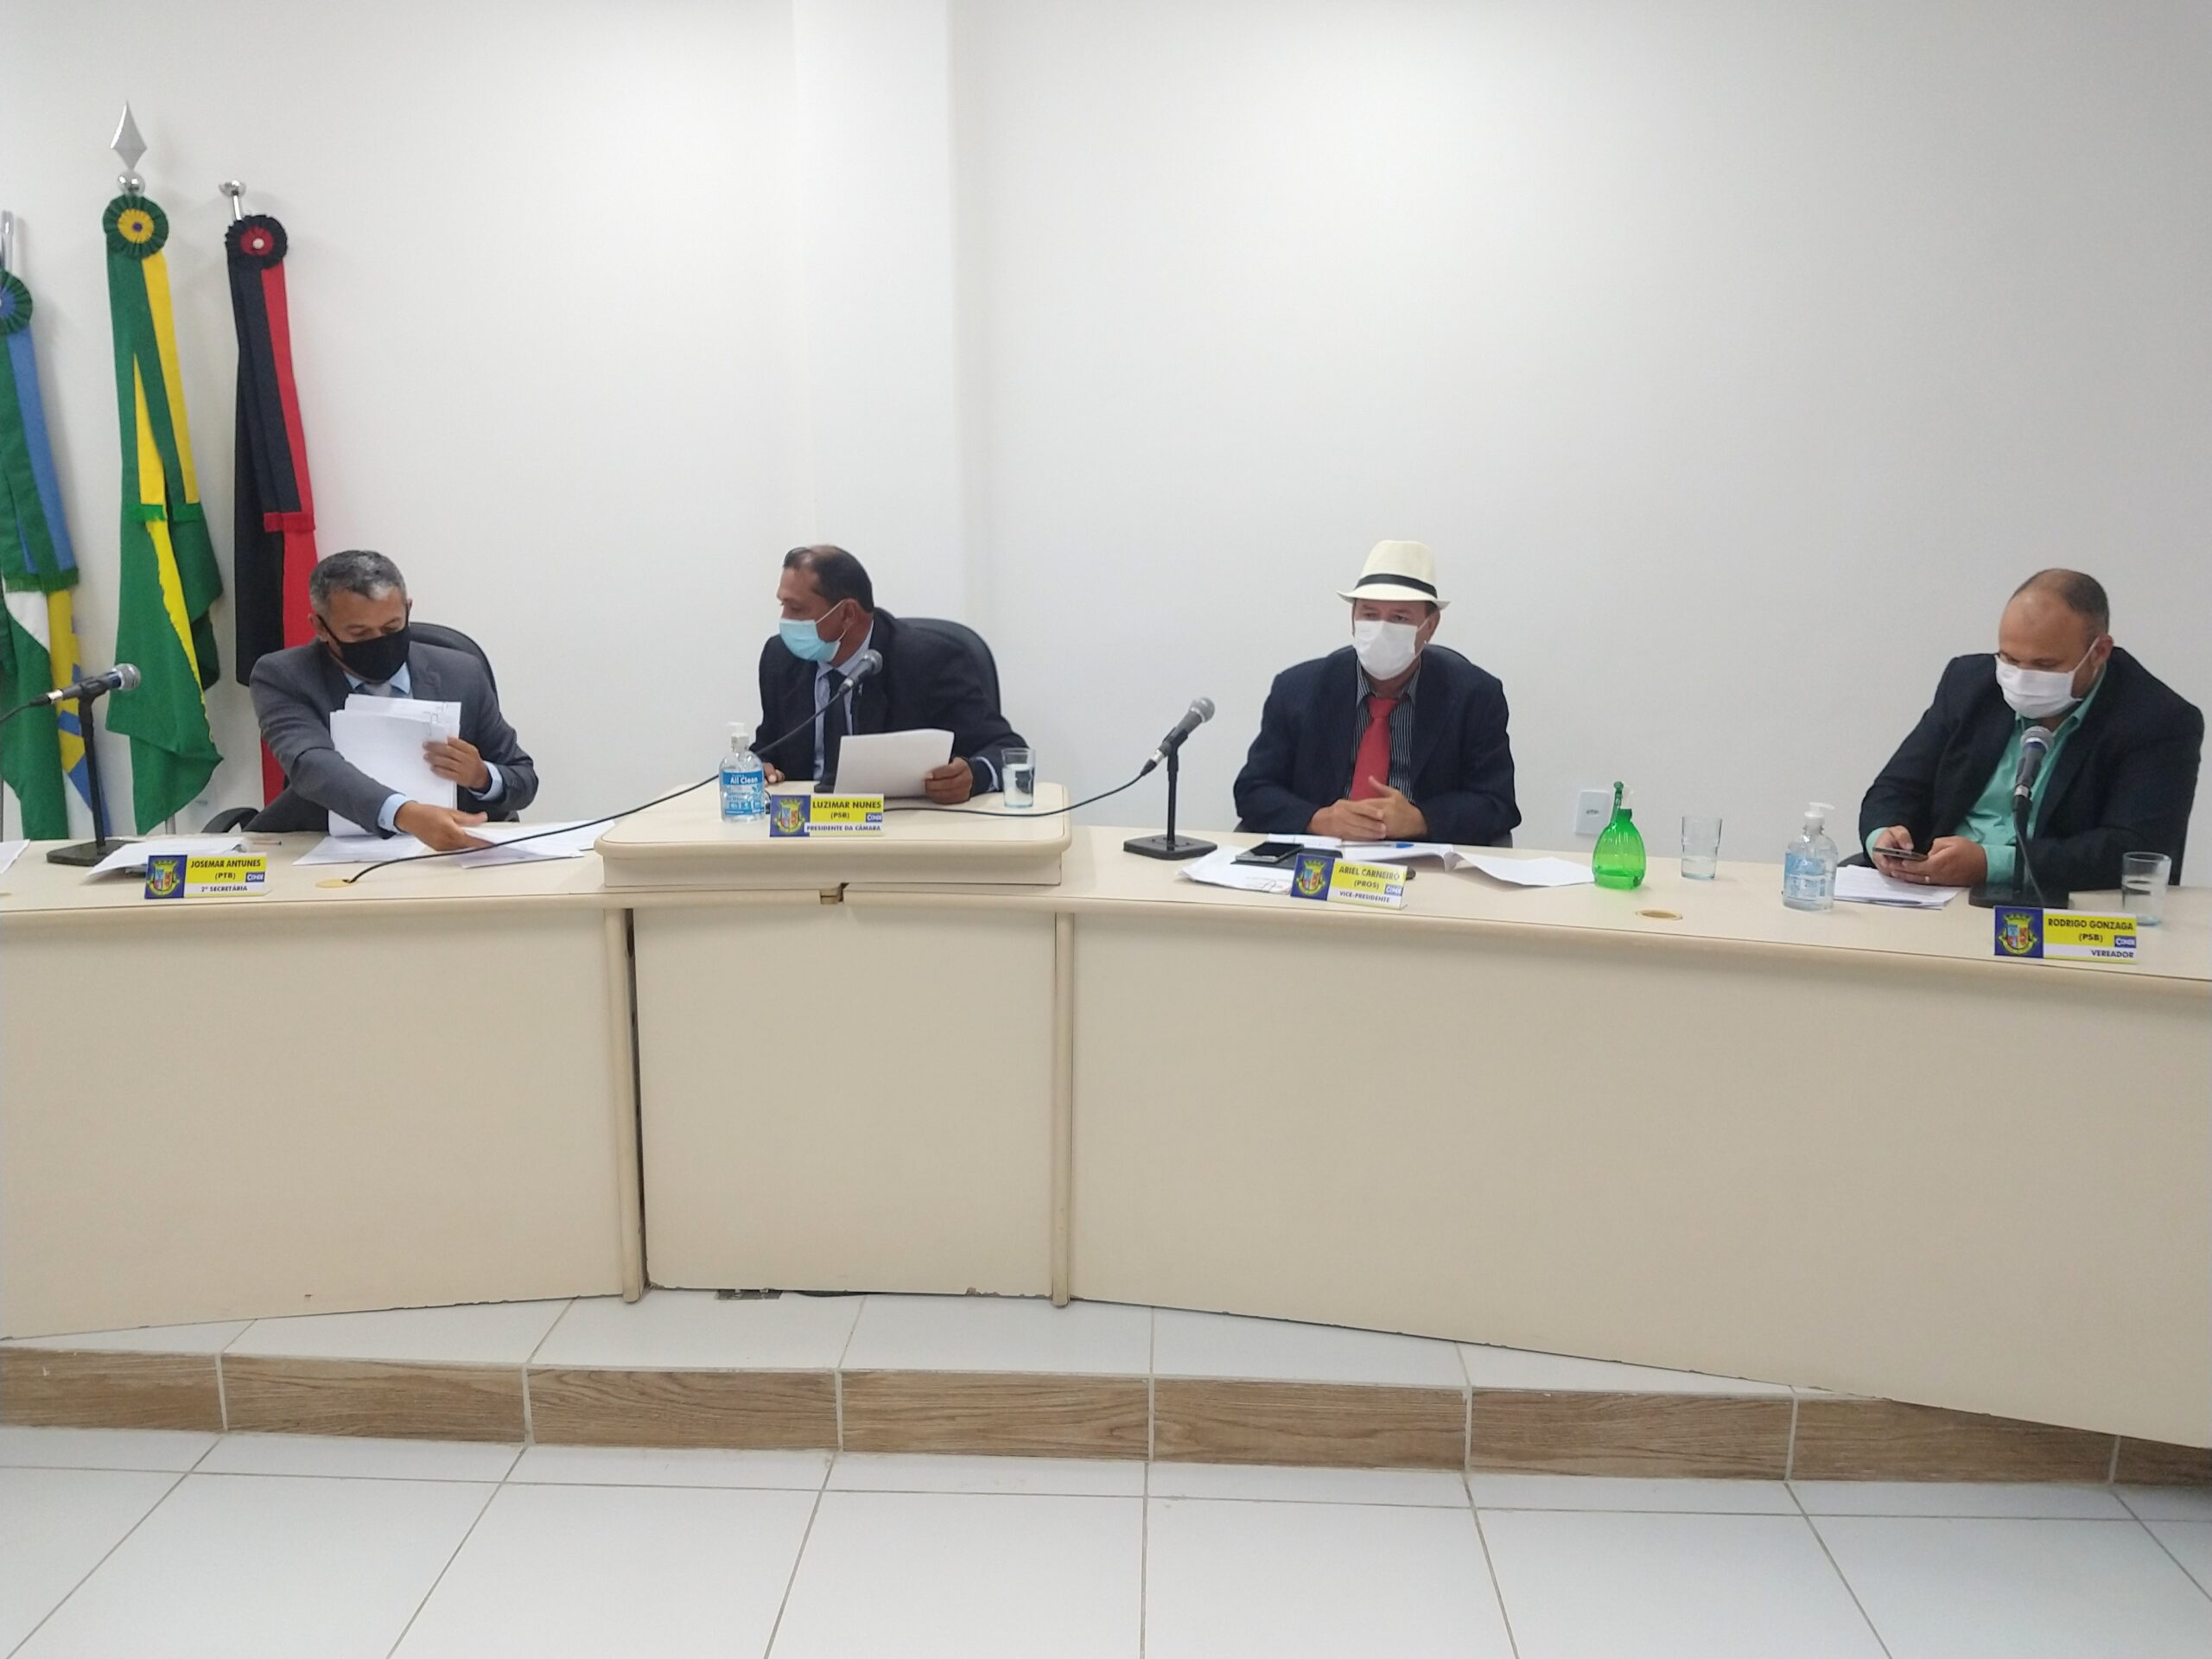 Câmara Municipal de Conde realizou atividades parlamentares nesta segunda-feira (12)